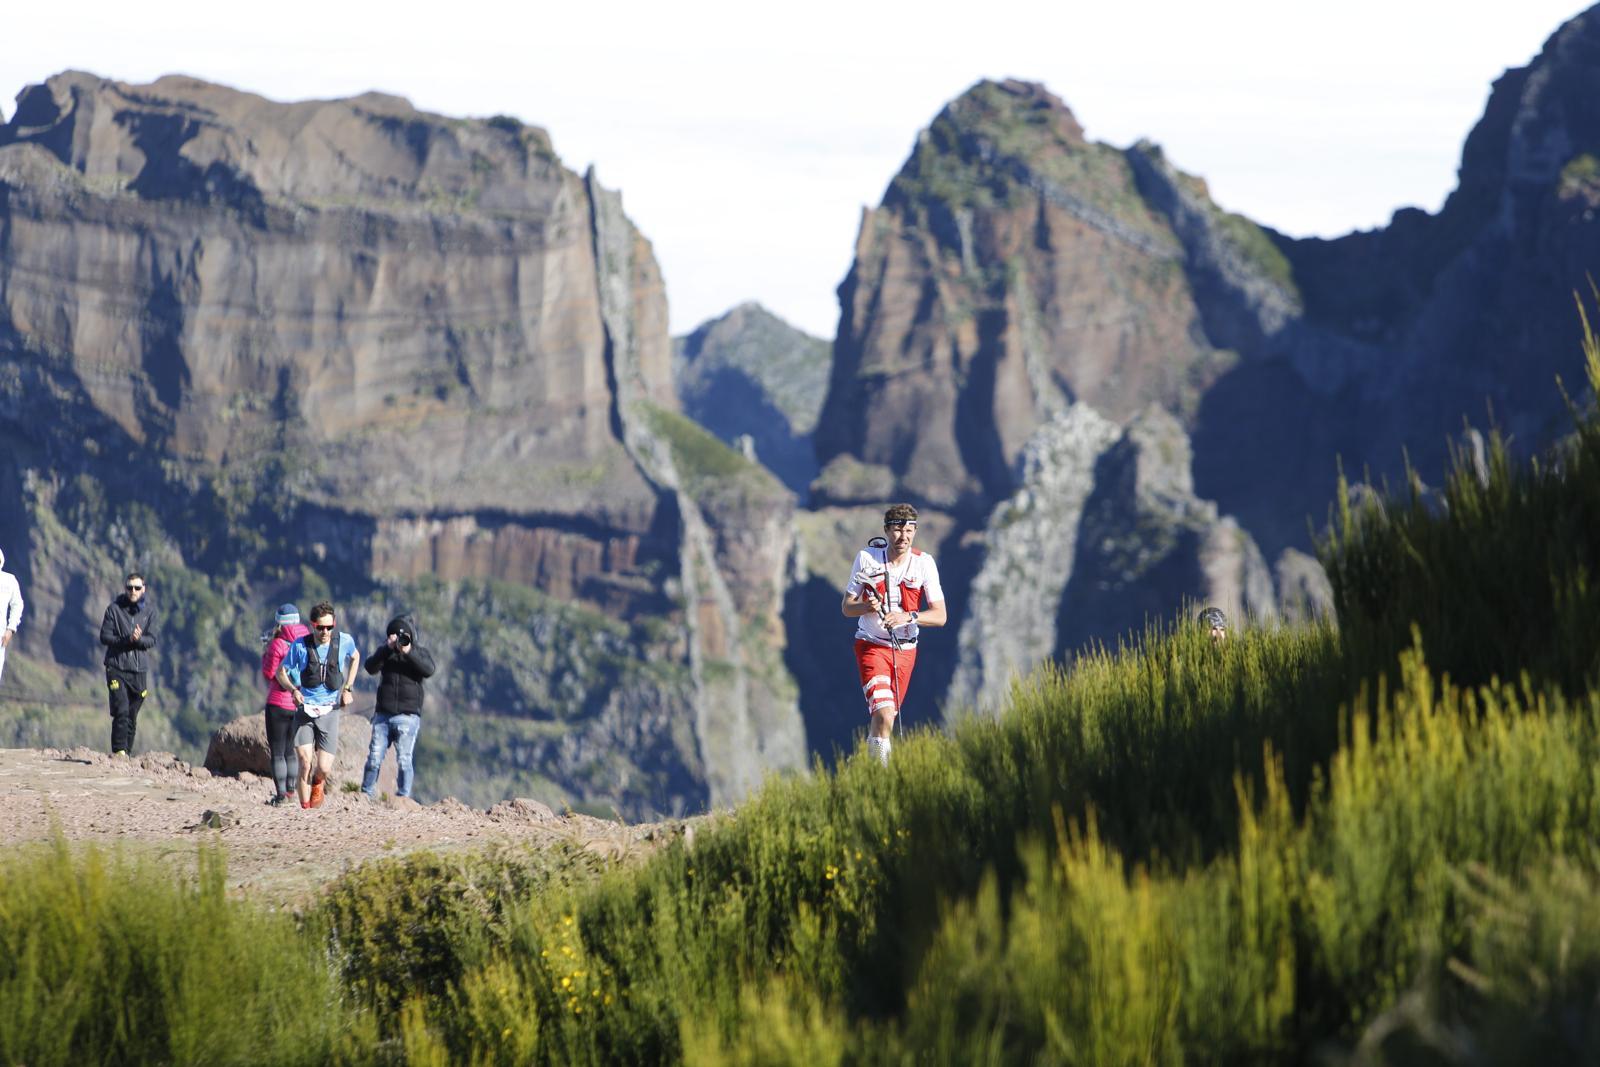 Madera Island Ultra Trail 2019: recorrido y previa 